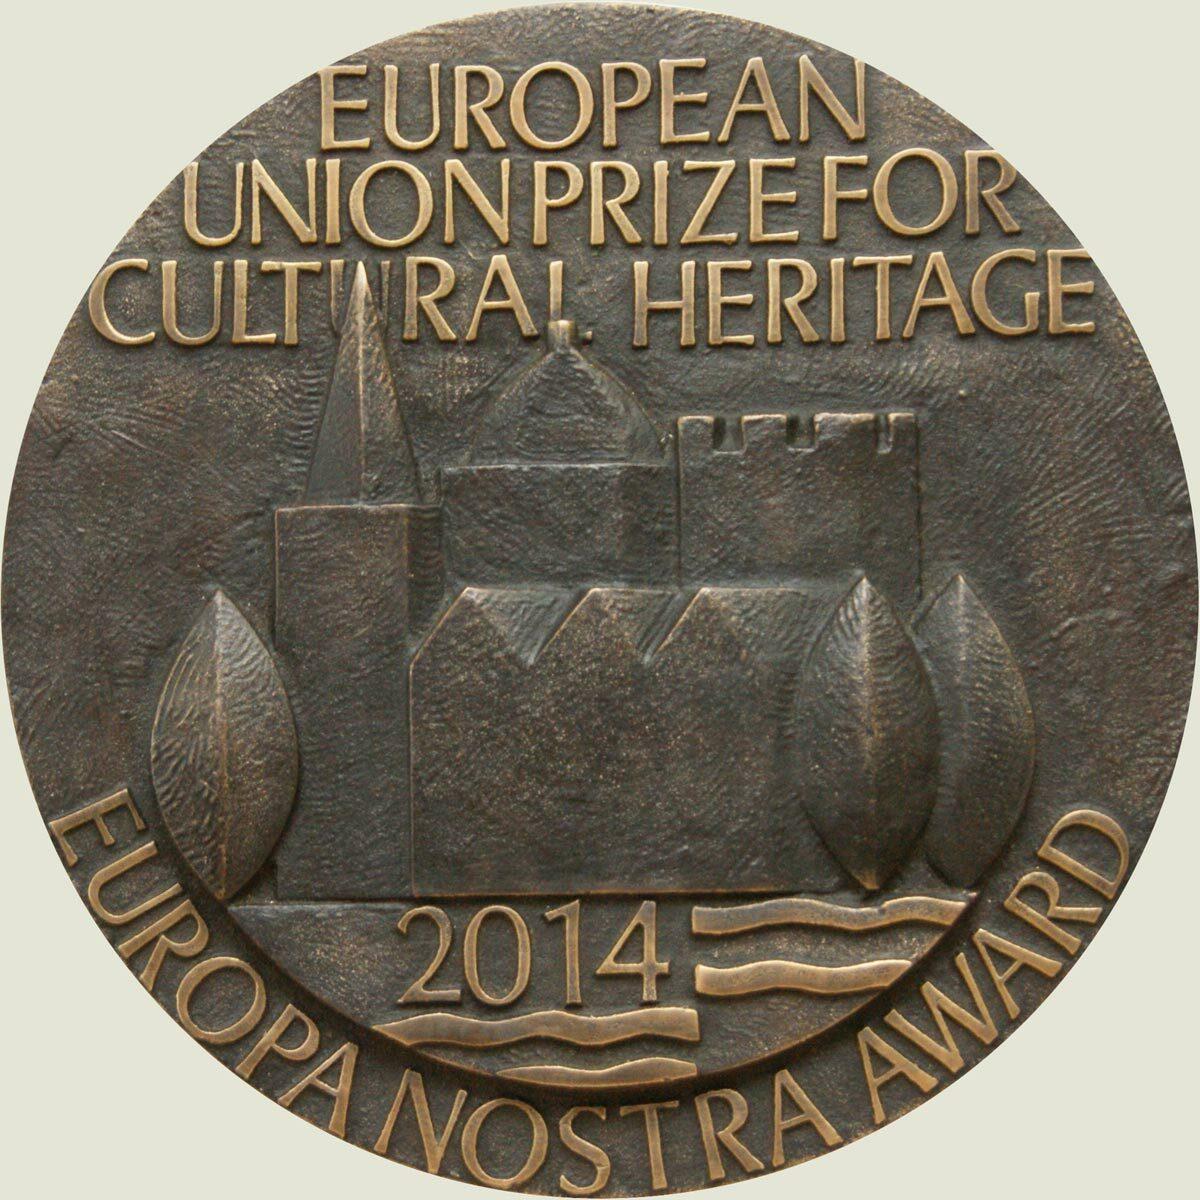 hovelsrud-gard-pris-14-2014-HA-plaque